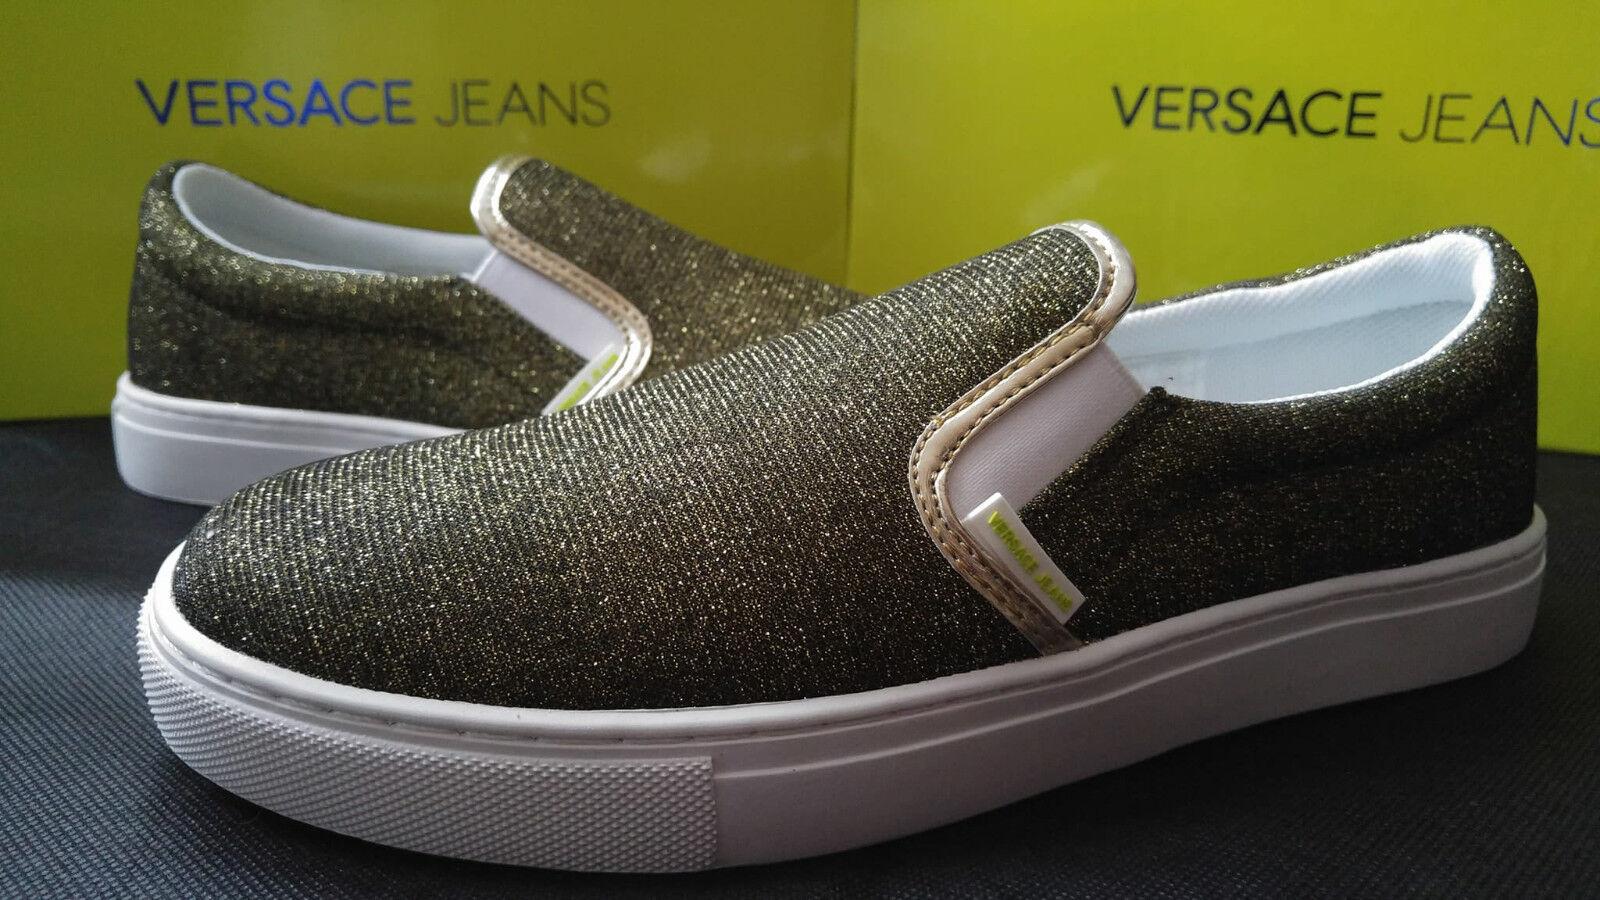 Versace Jeans Damens's slip-on Größe 38EU